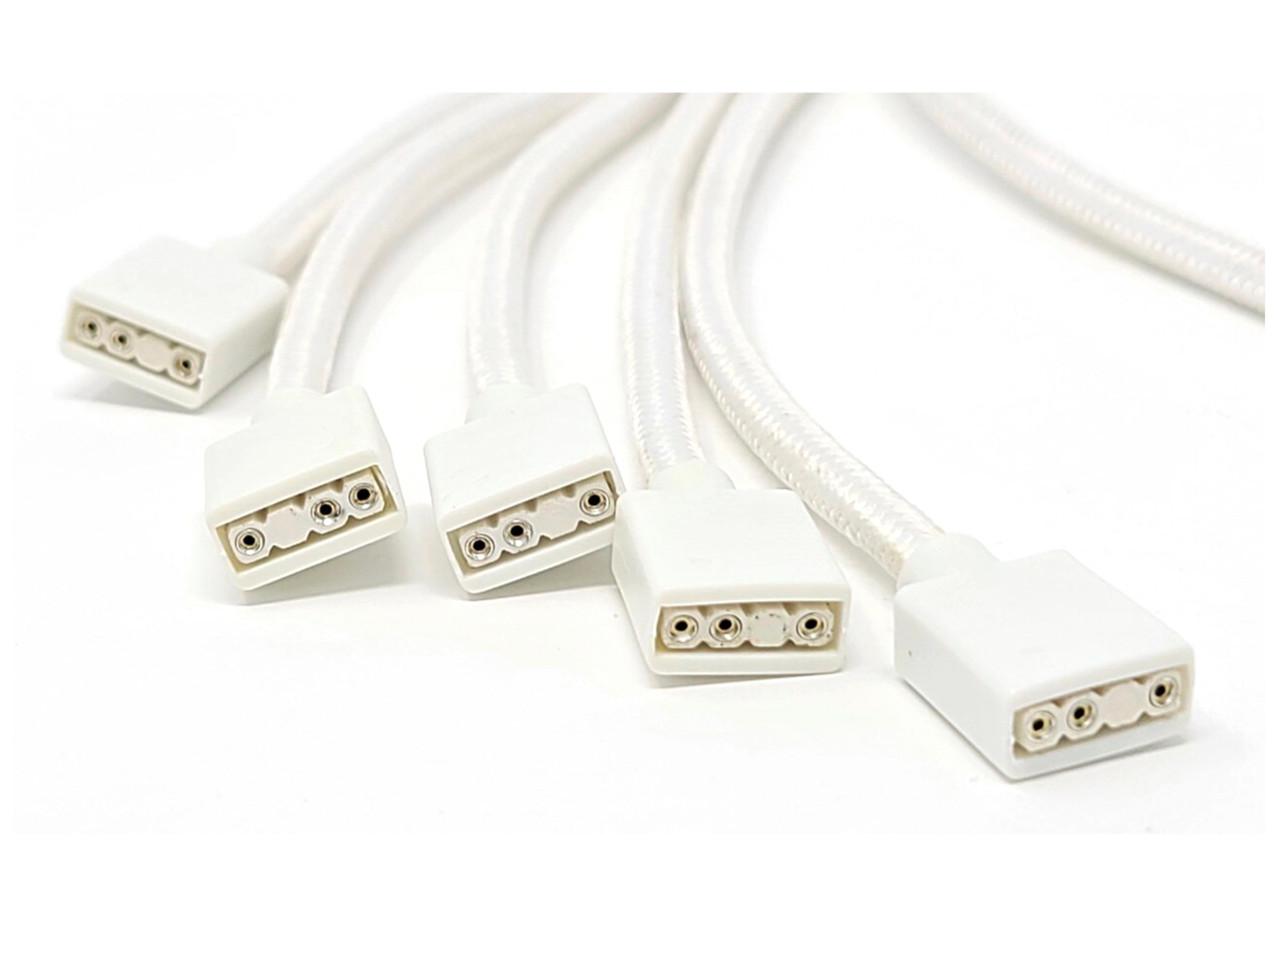 70cm Premium Sleeved 3-Pin 1 to 5 Addressable (ARGB) Splitter Cable (White)